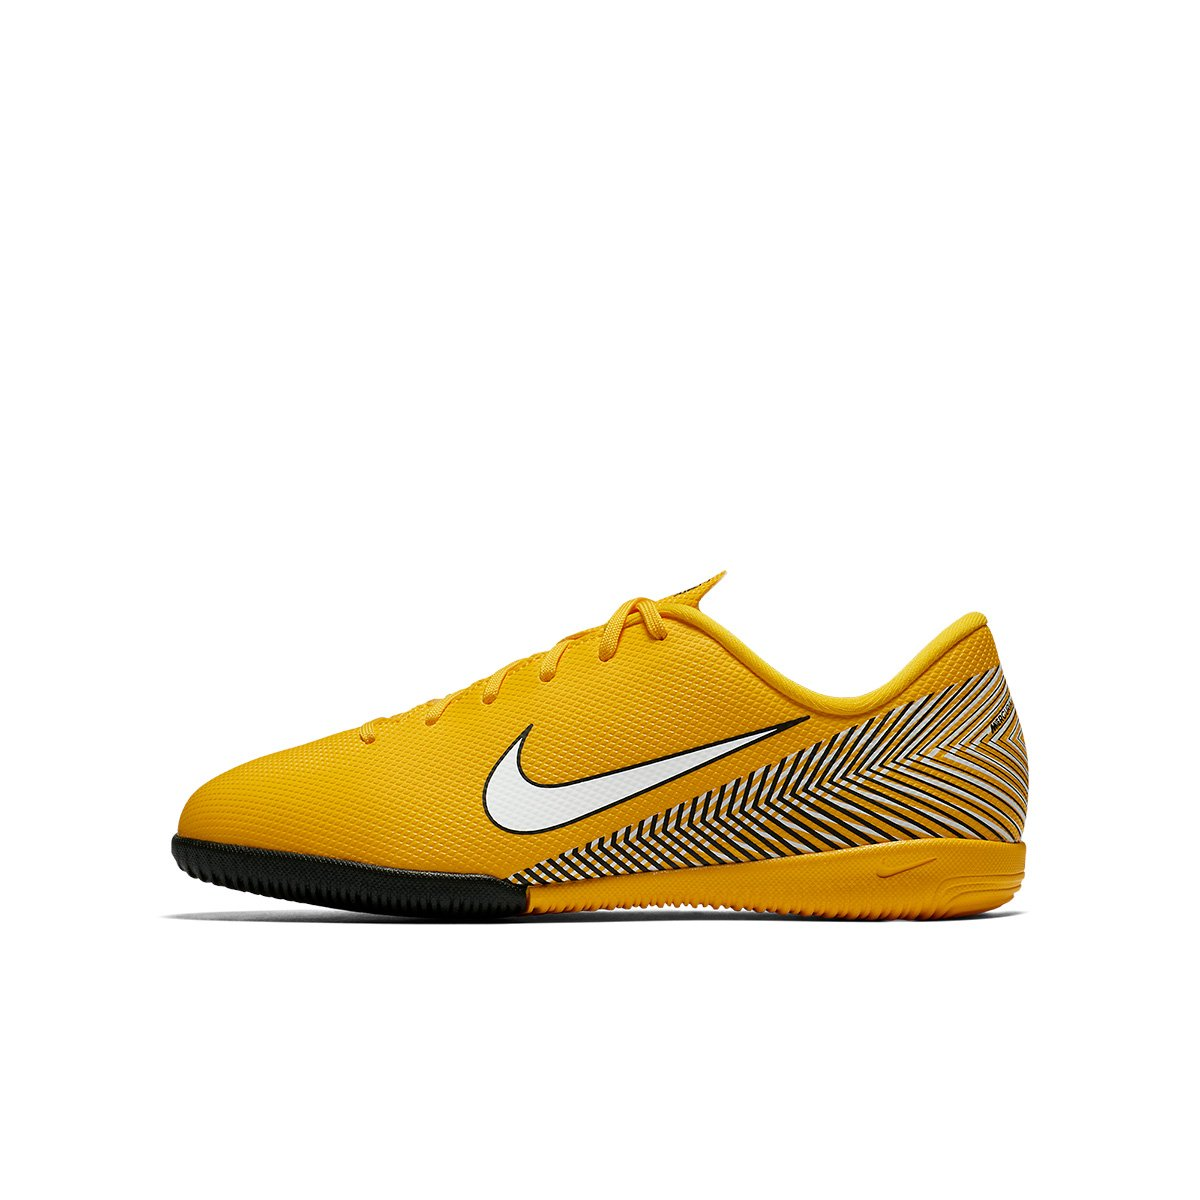 93294464aaa84 Chuteira Futsal Infantil Nike Mercurial Academy GS Neymar IC - Amarelo e  Preto | Allianz Parque Shop